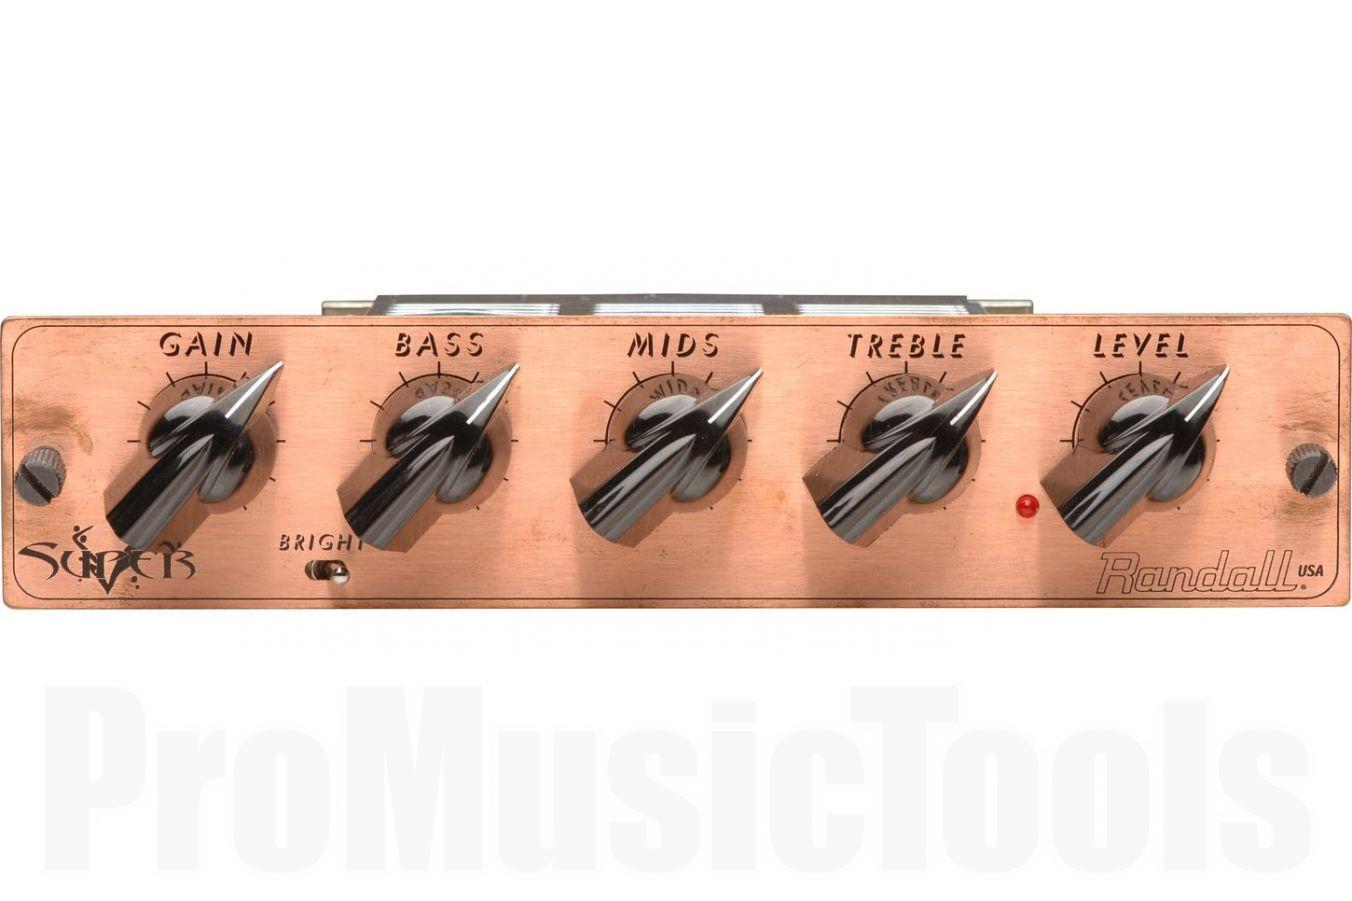 Randall USA MTS Super V - George Lynch signature guitar amp module